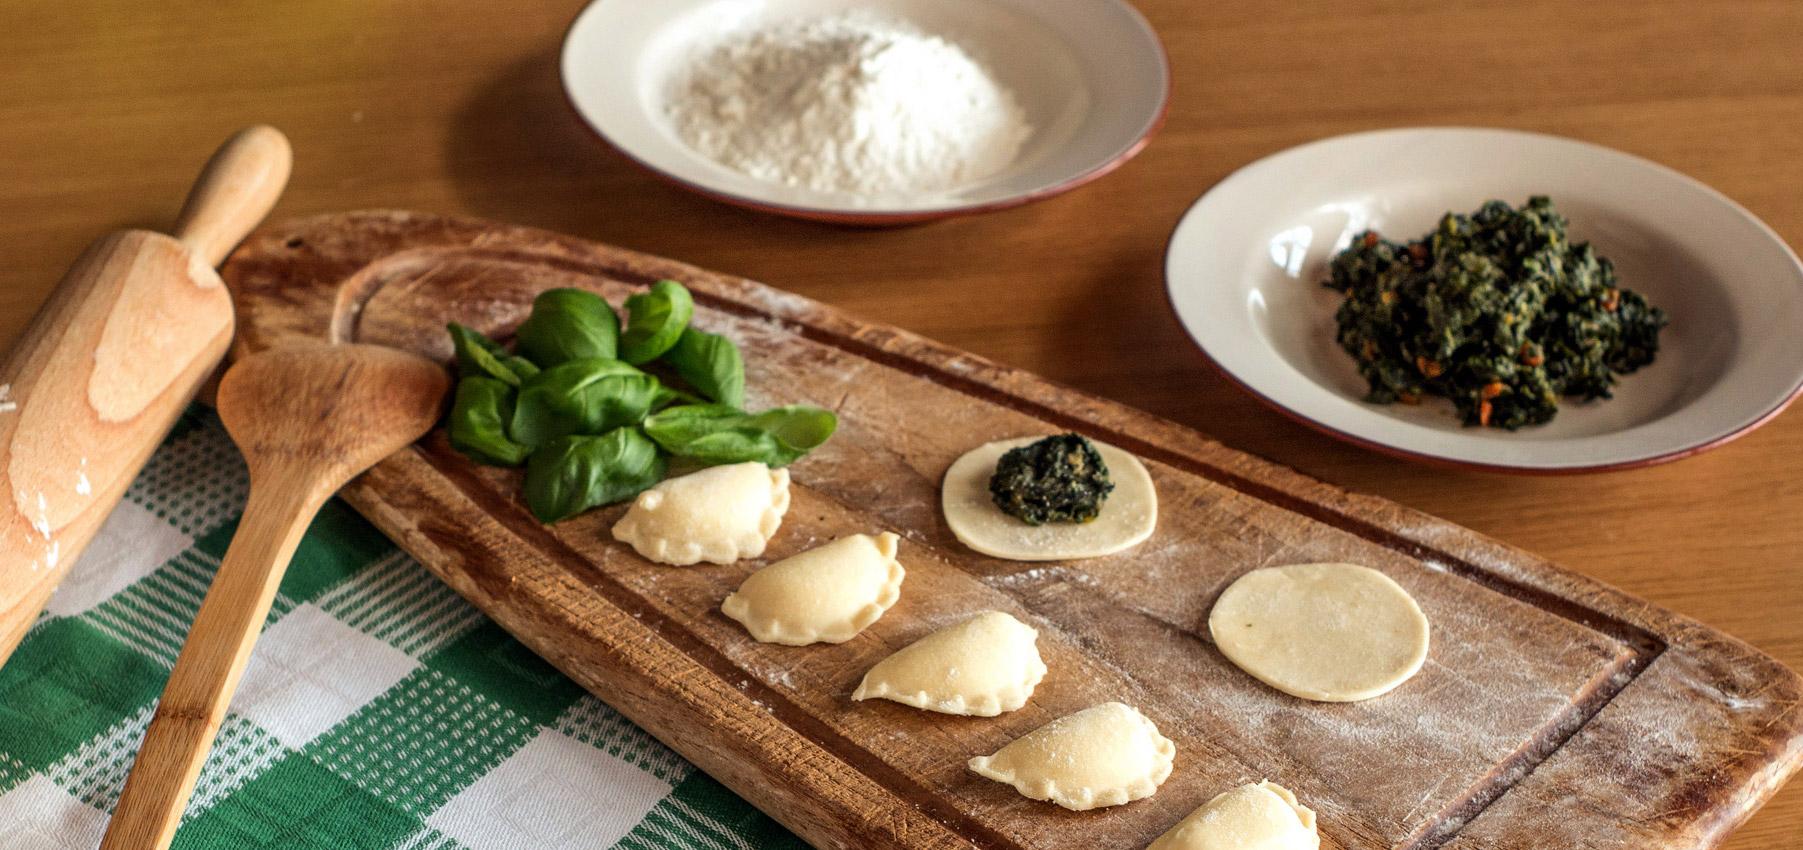 Kuchnia Polki w Twoim domu